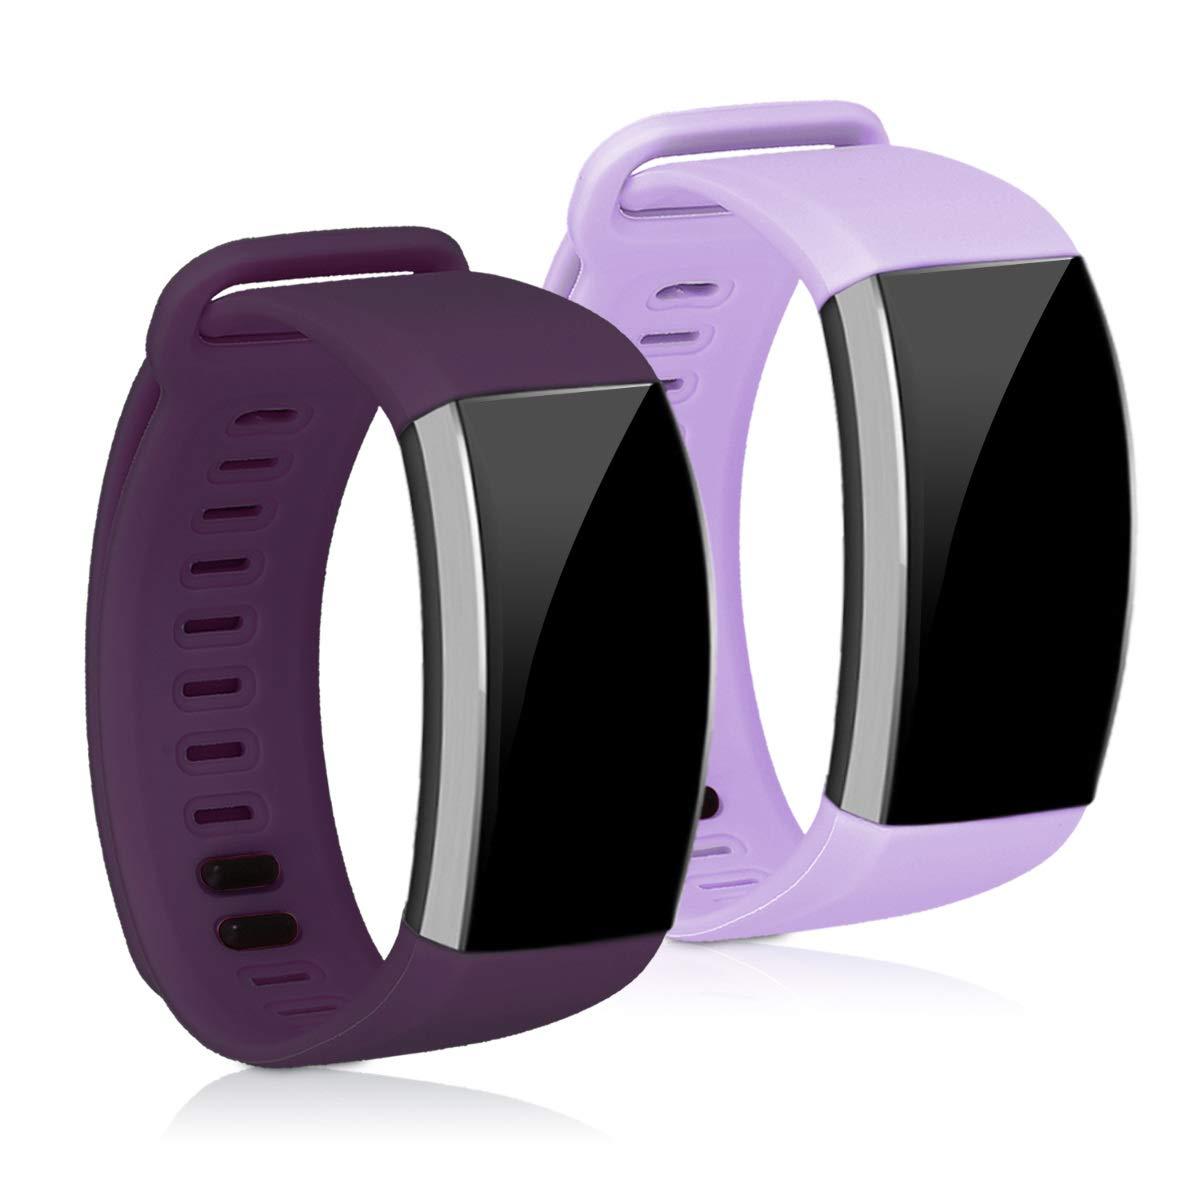 kwmobile 2X Pulsera para Huawei Band 2 / Band 2 Pro - Brazalete de Silicona púrpura Pastel/Violeta sin Fitness Tracker